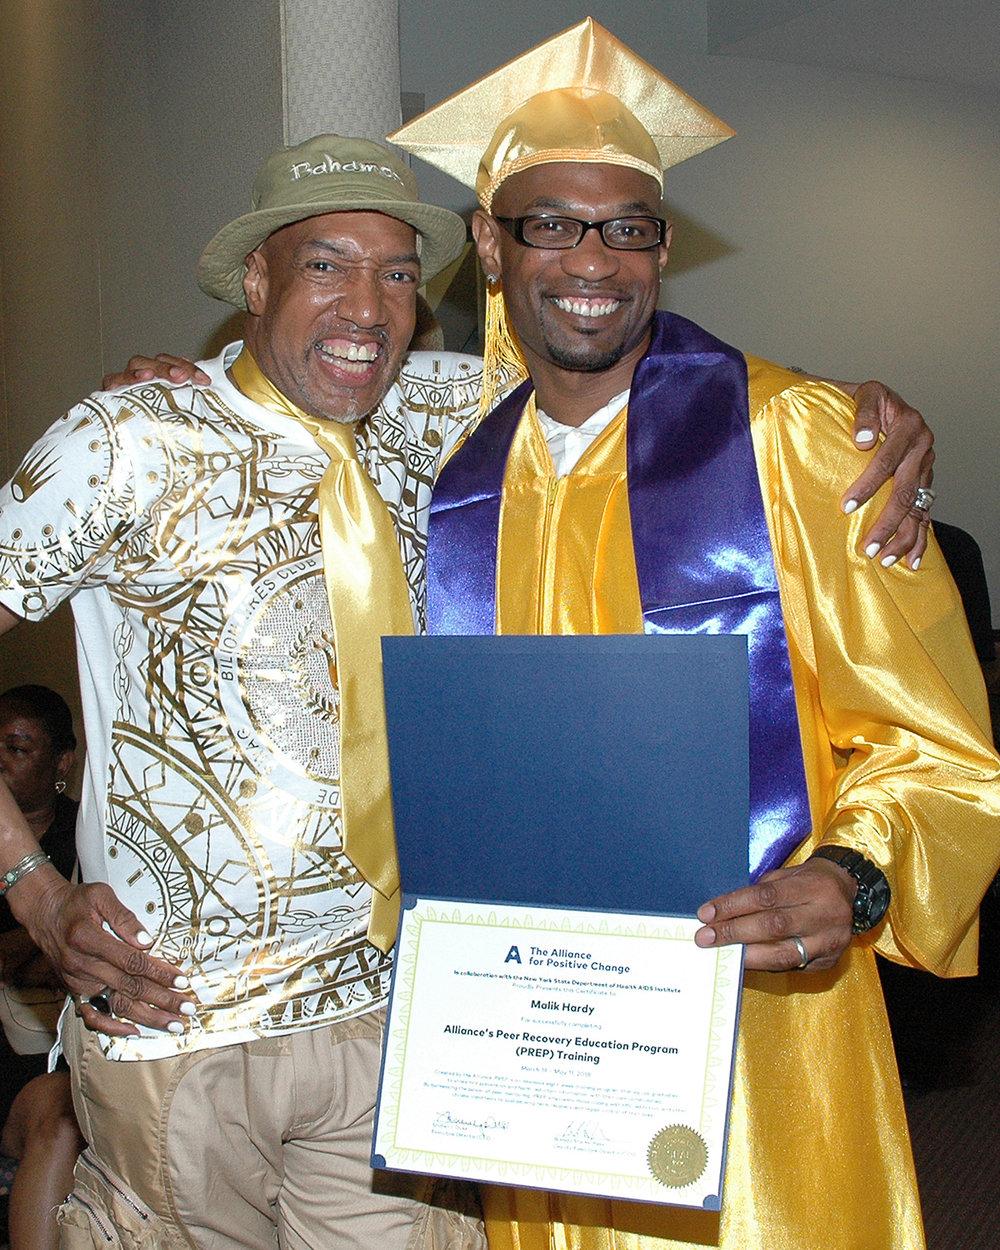 Thomas P. and Malik H. with Malik's certificate